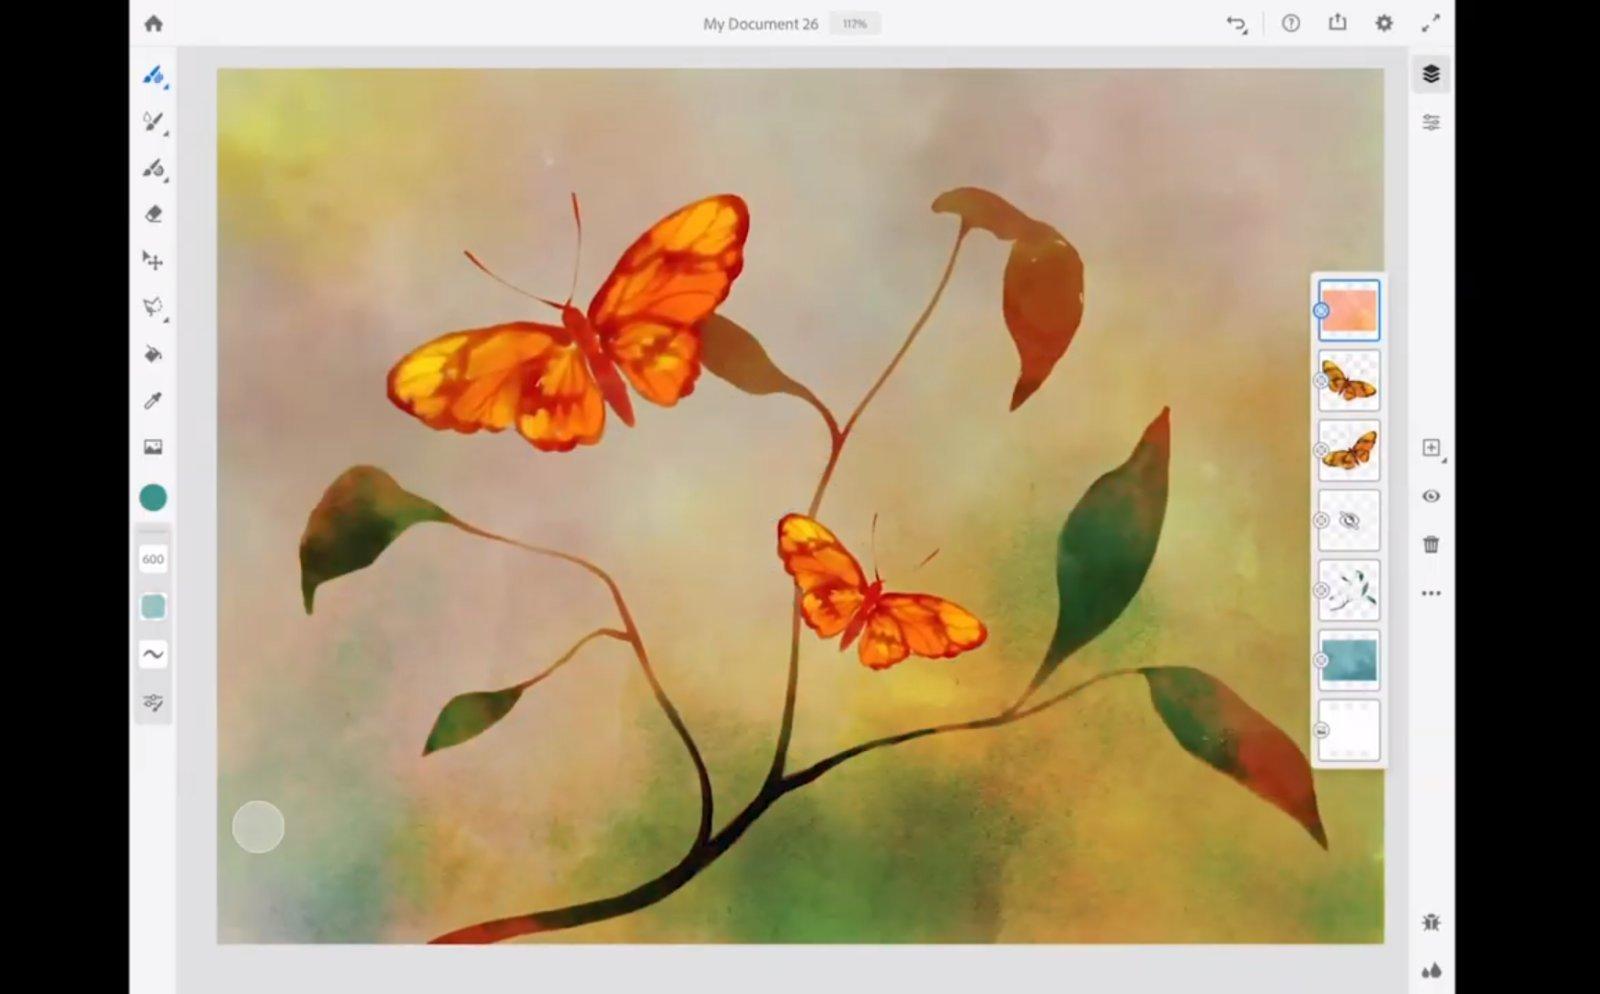 Adobe ще издаде алтернатива за Photoshop – Adobe Fresco